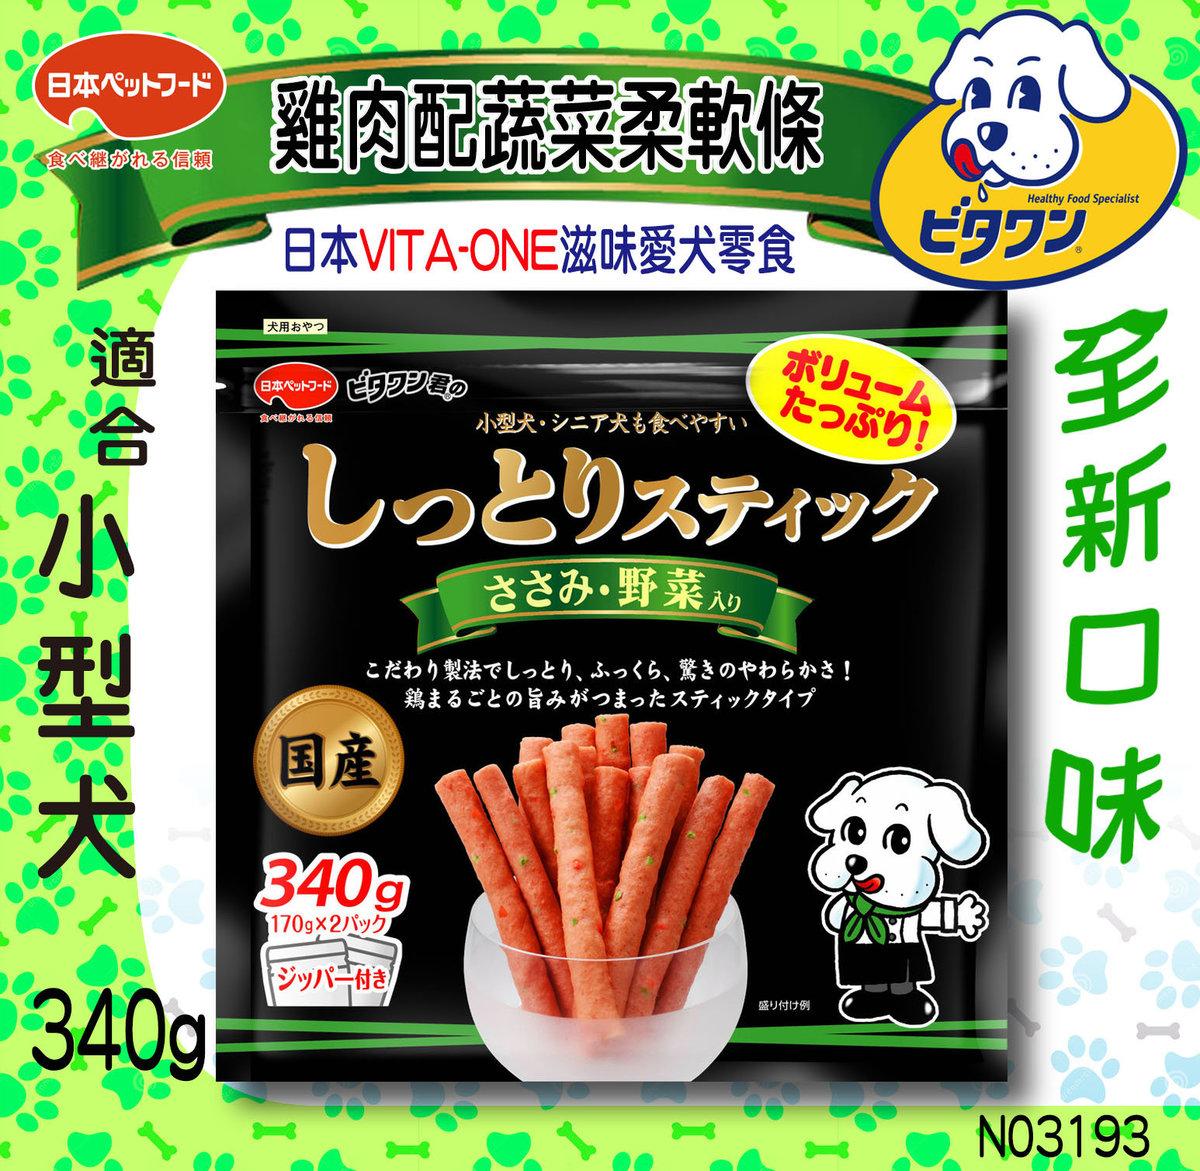 VITA-ONE 日本滋味愛犬零食 雞肉配蔬菜柔軟條 340克